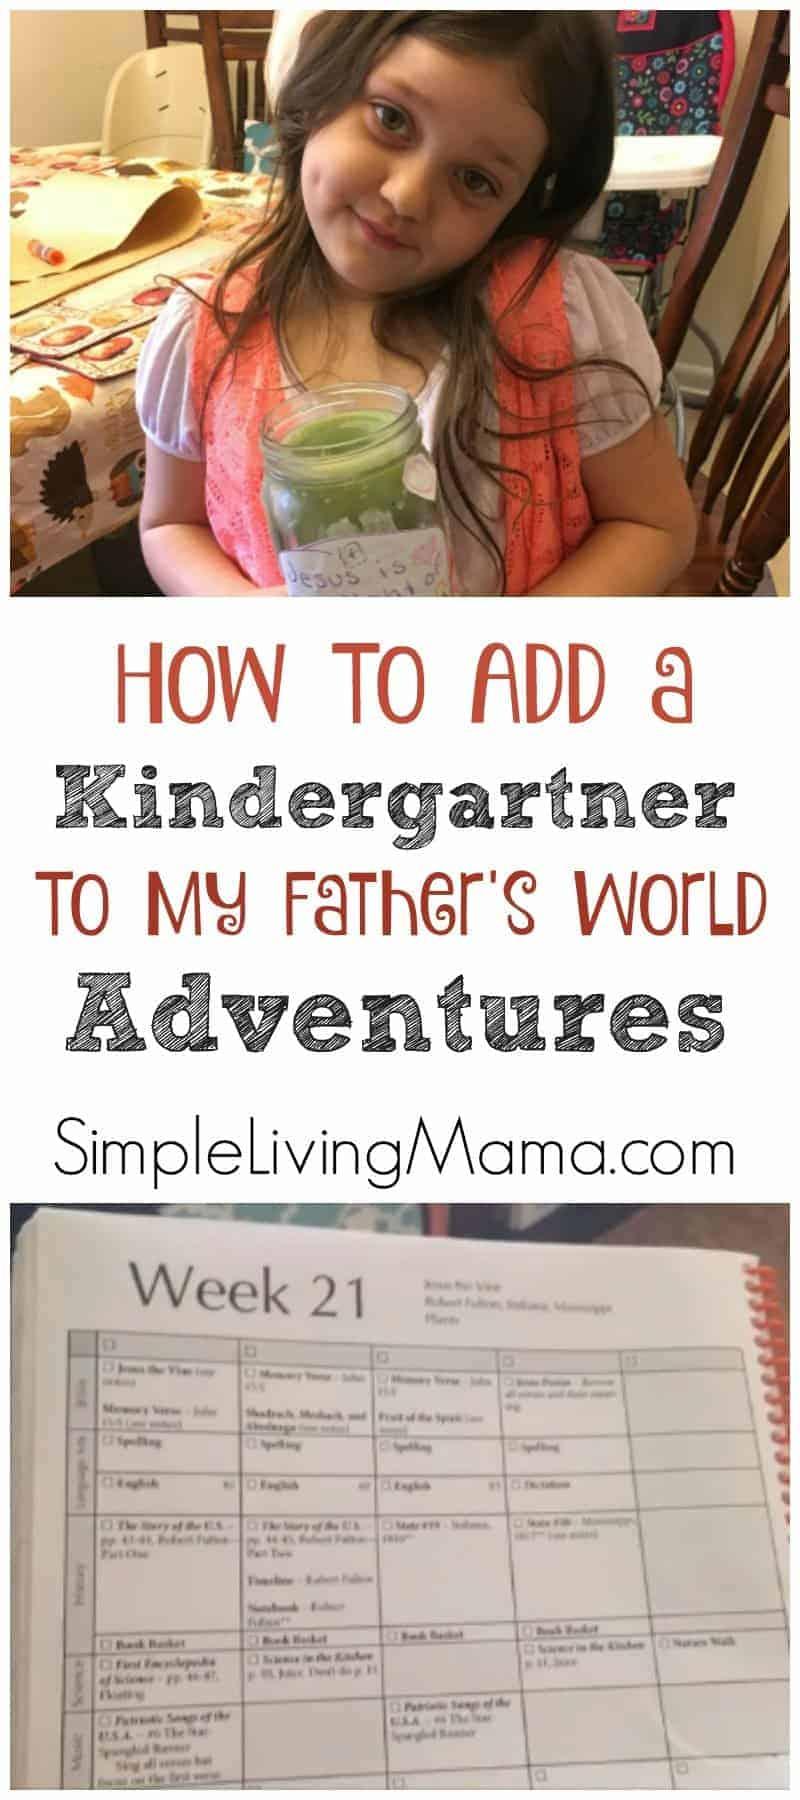 Adding a kindergartner to mfw adventures